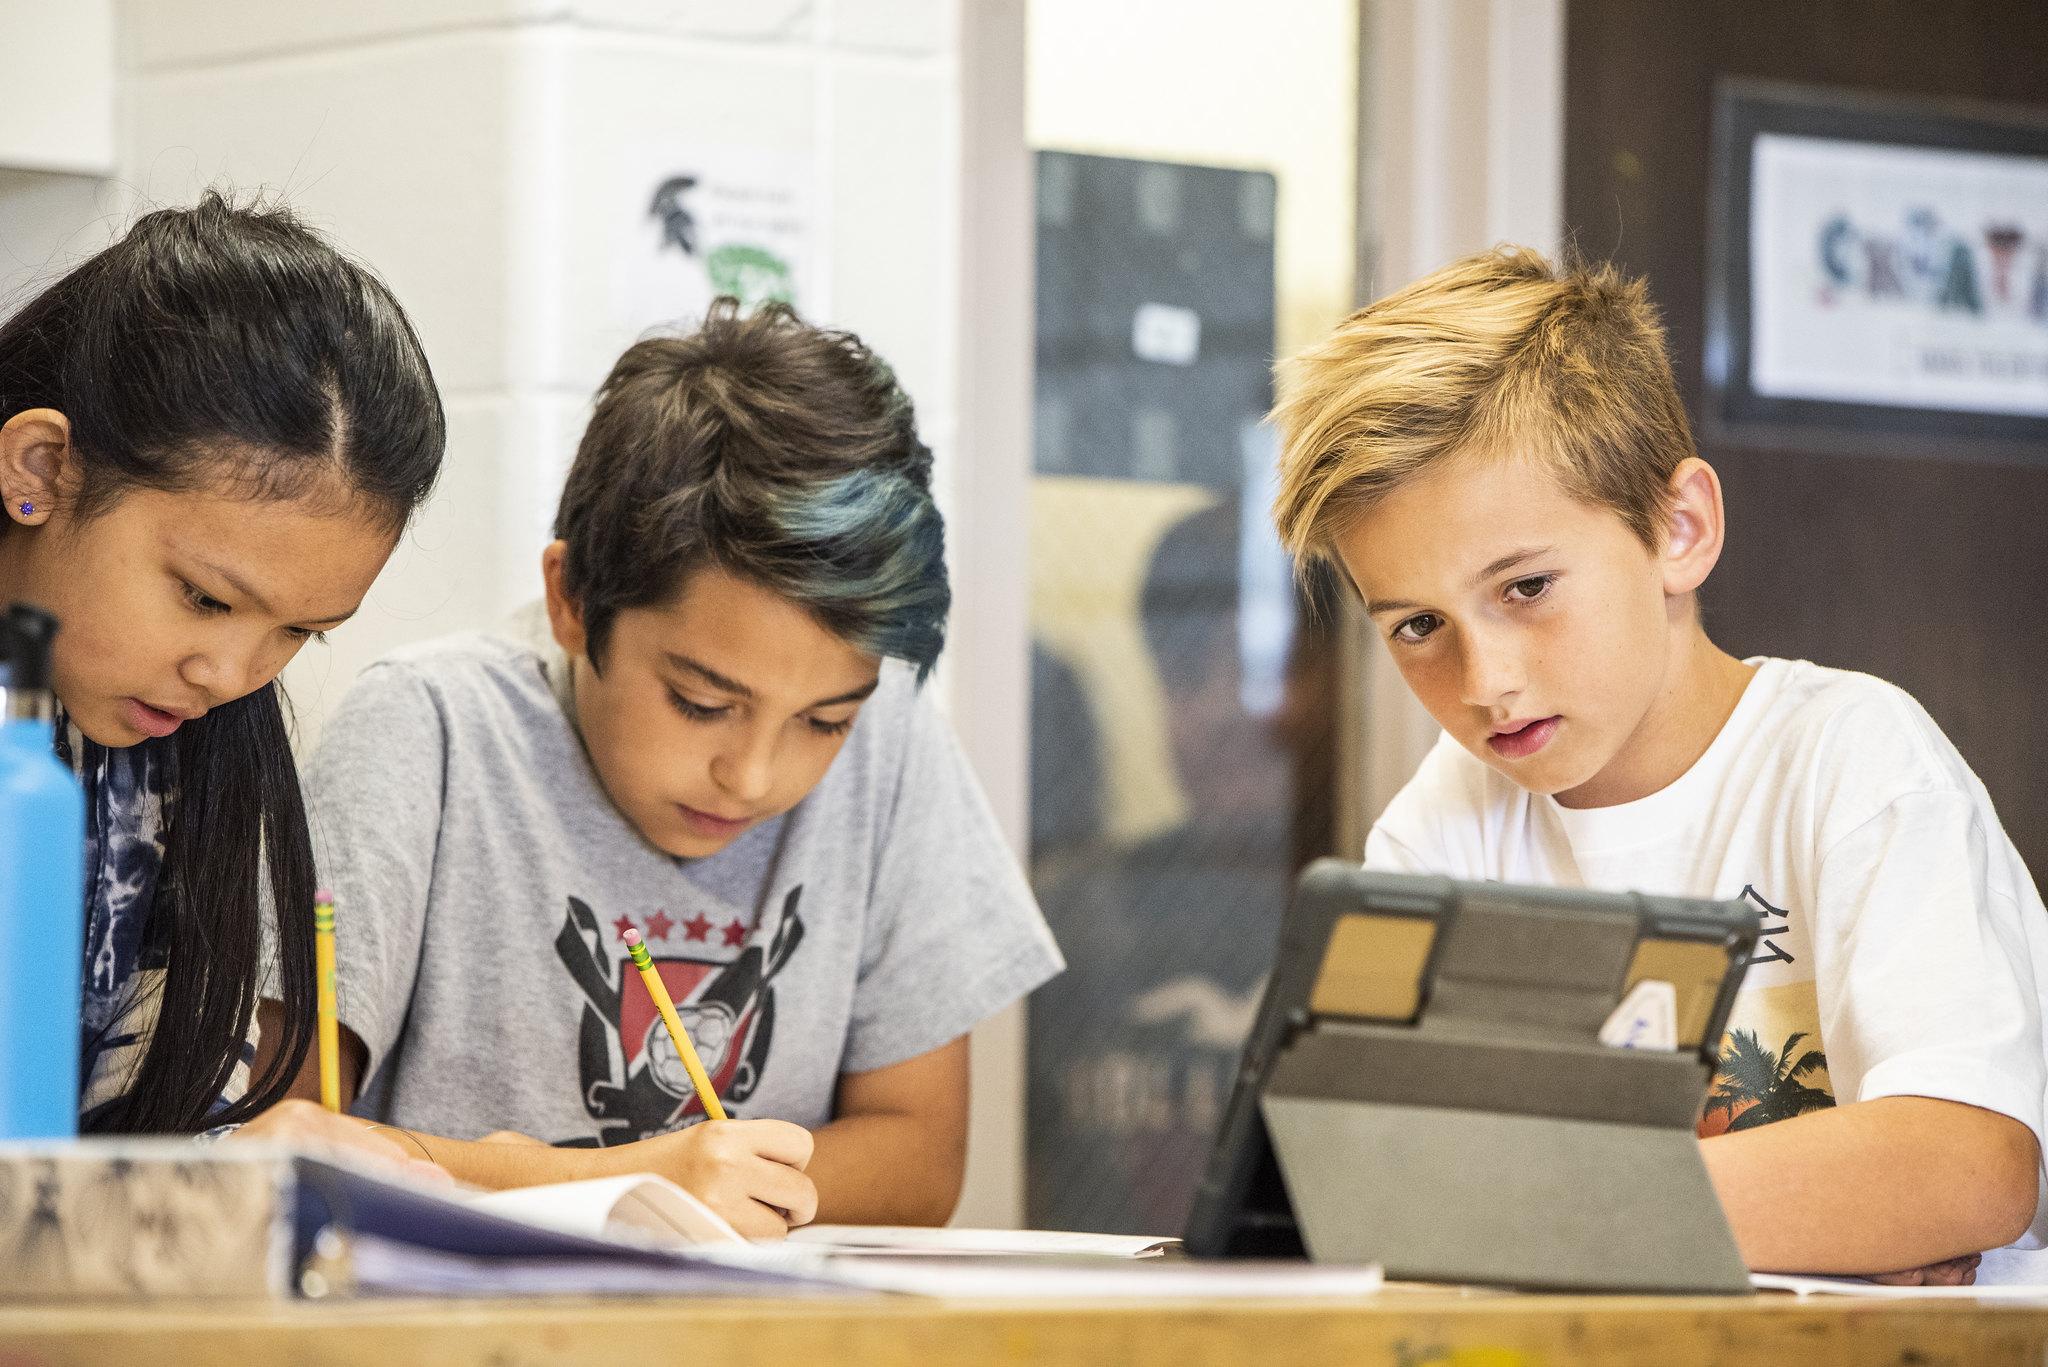 three students working on an ipad